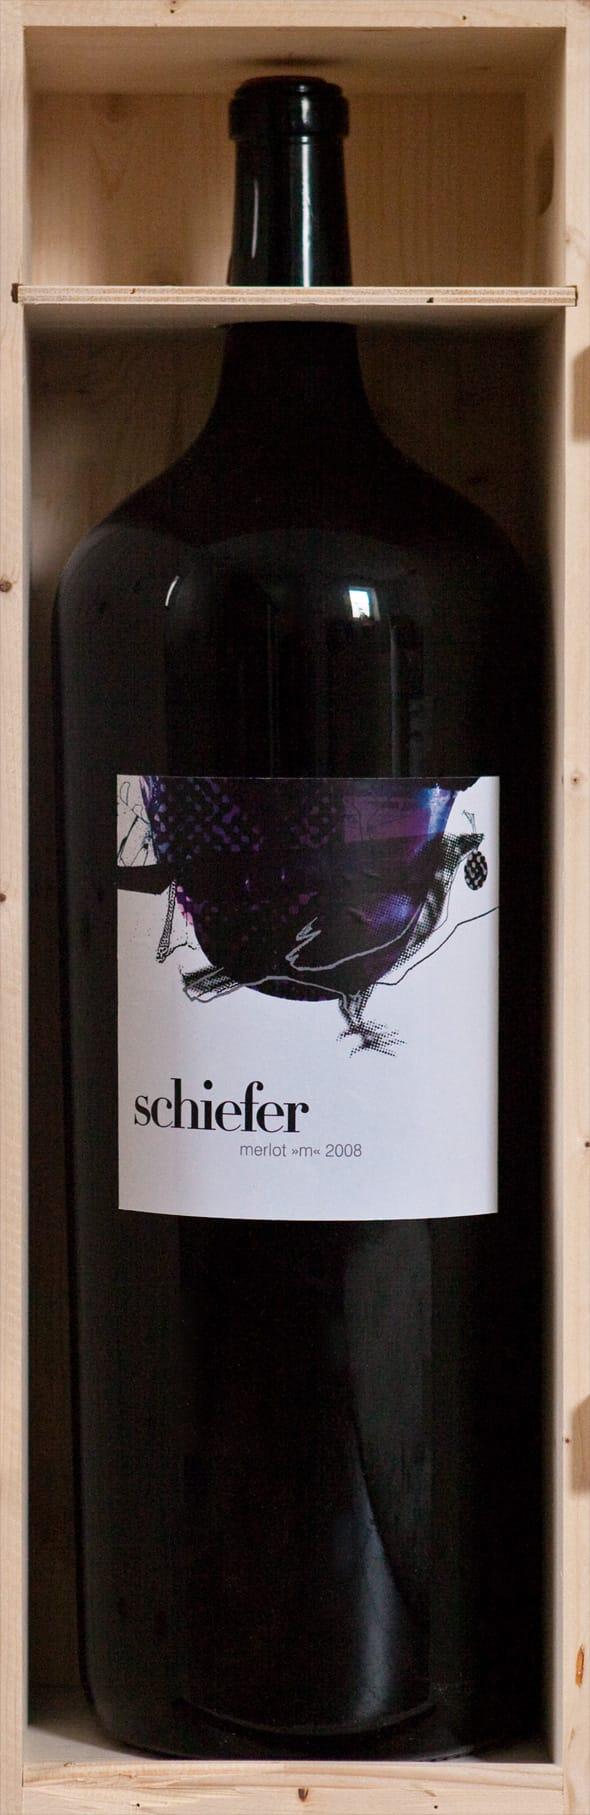 2010 schiefer merlot 01